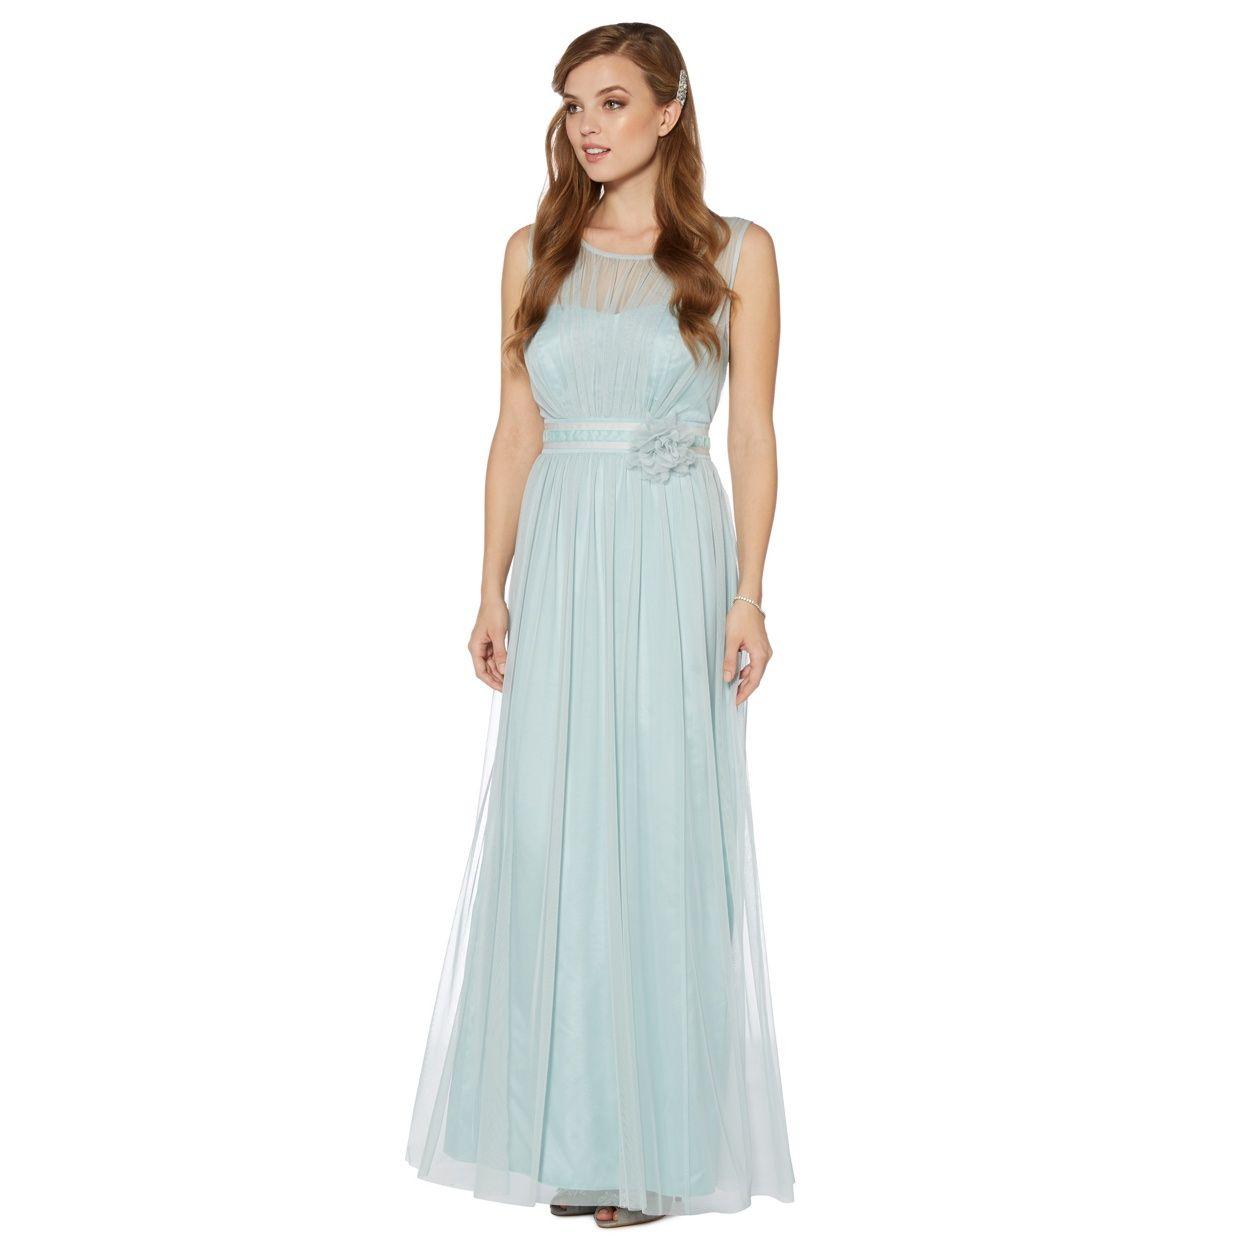 Debut Pale green mesh build corsage maxi dress- at Debenhams.com ...